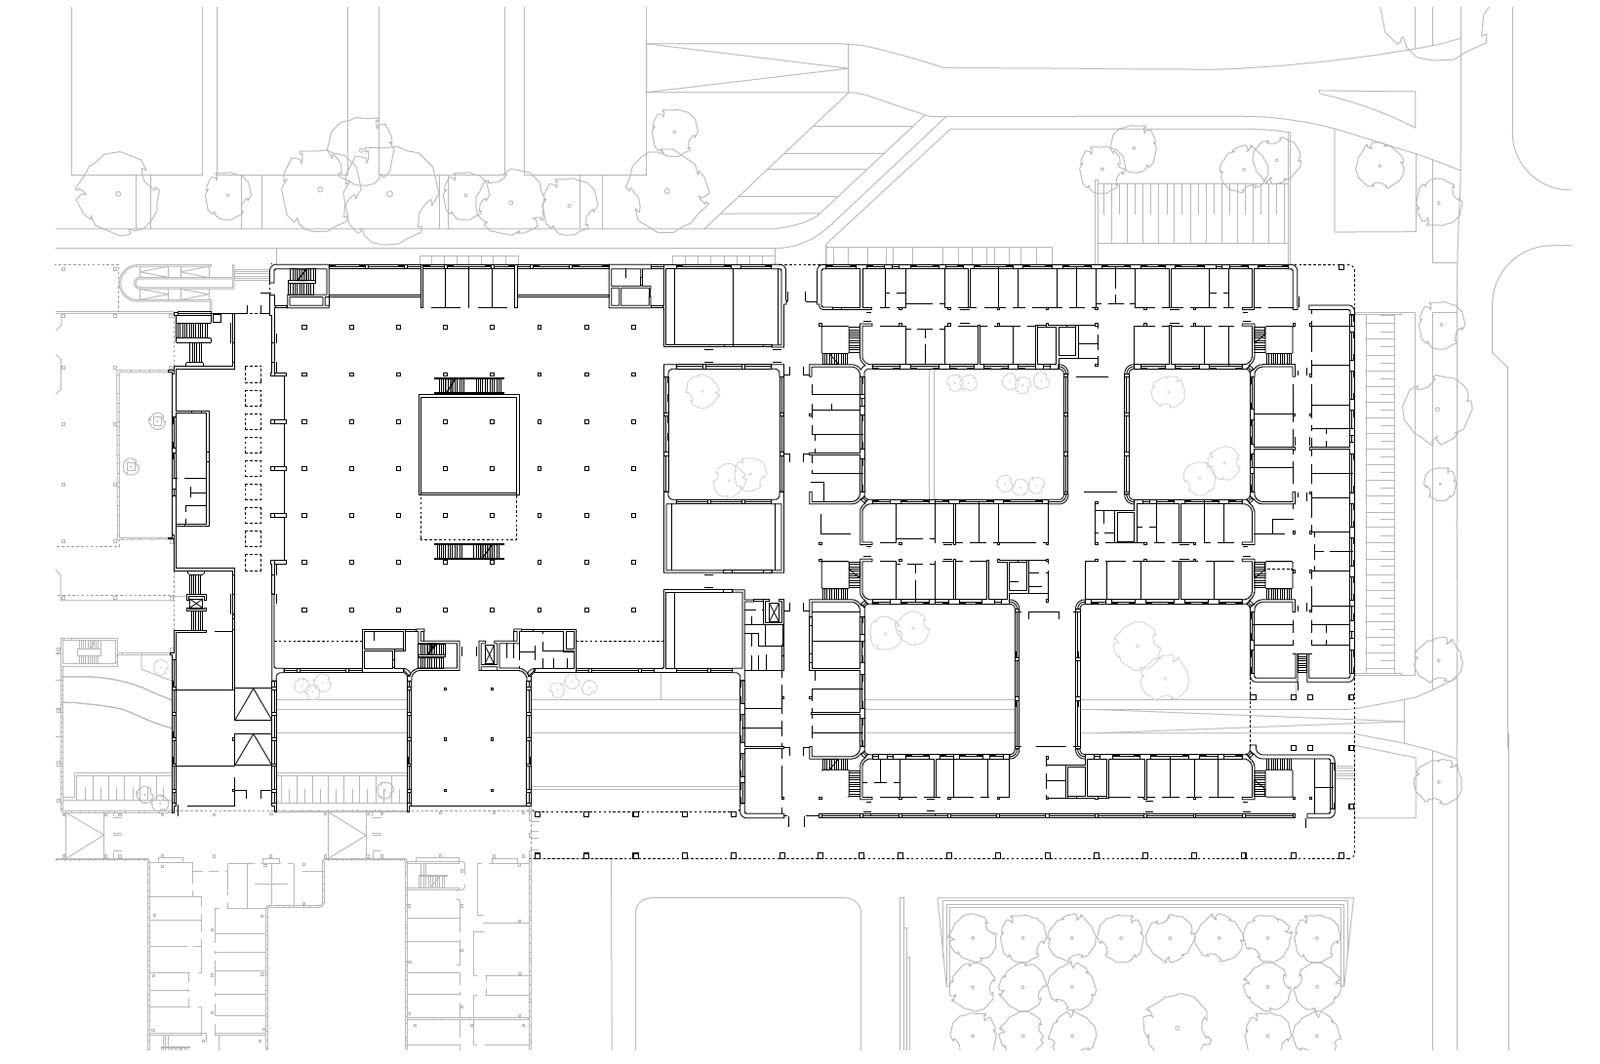 @Uncube The radically modular Free University of West Berlin